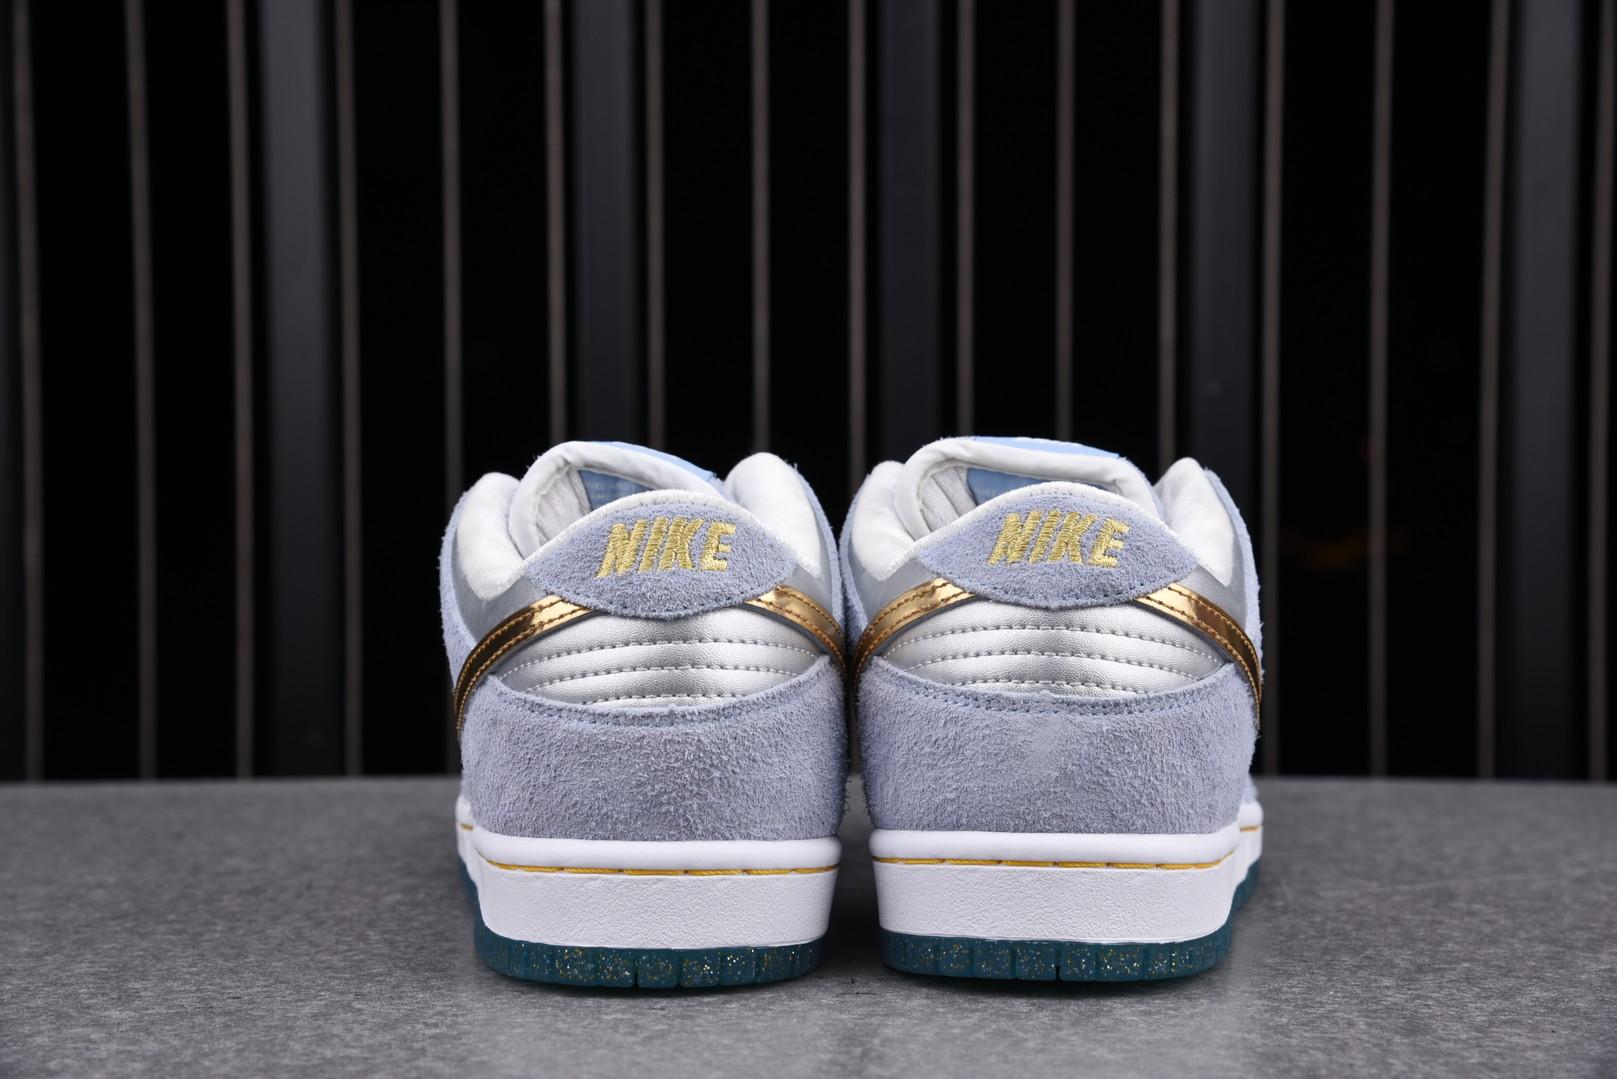 Giày Nike SB Dunk Sean Cliver